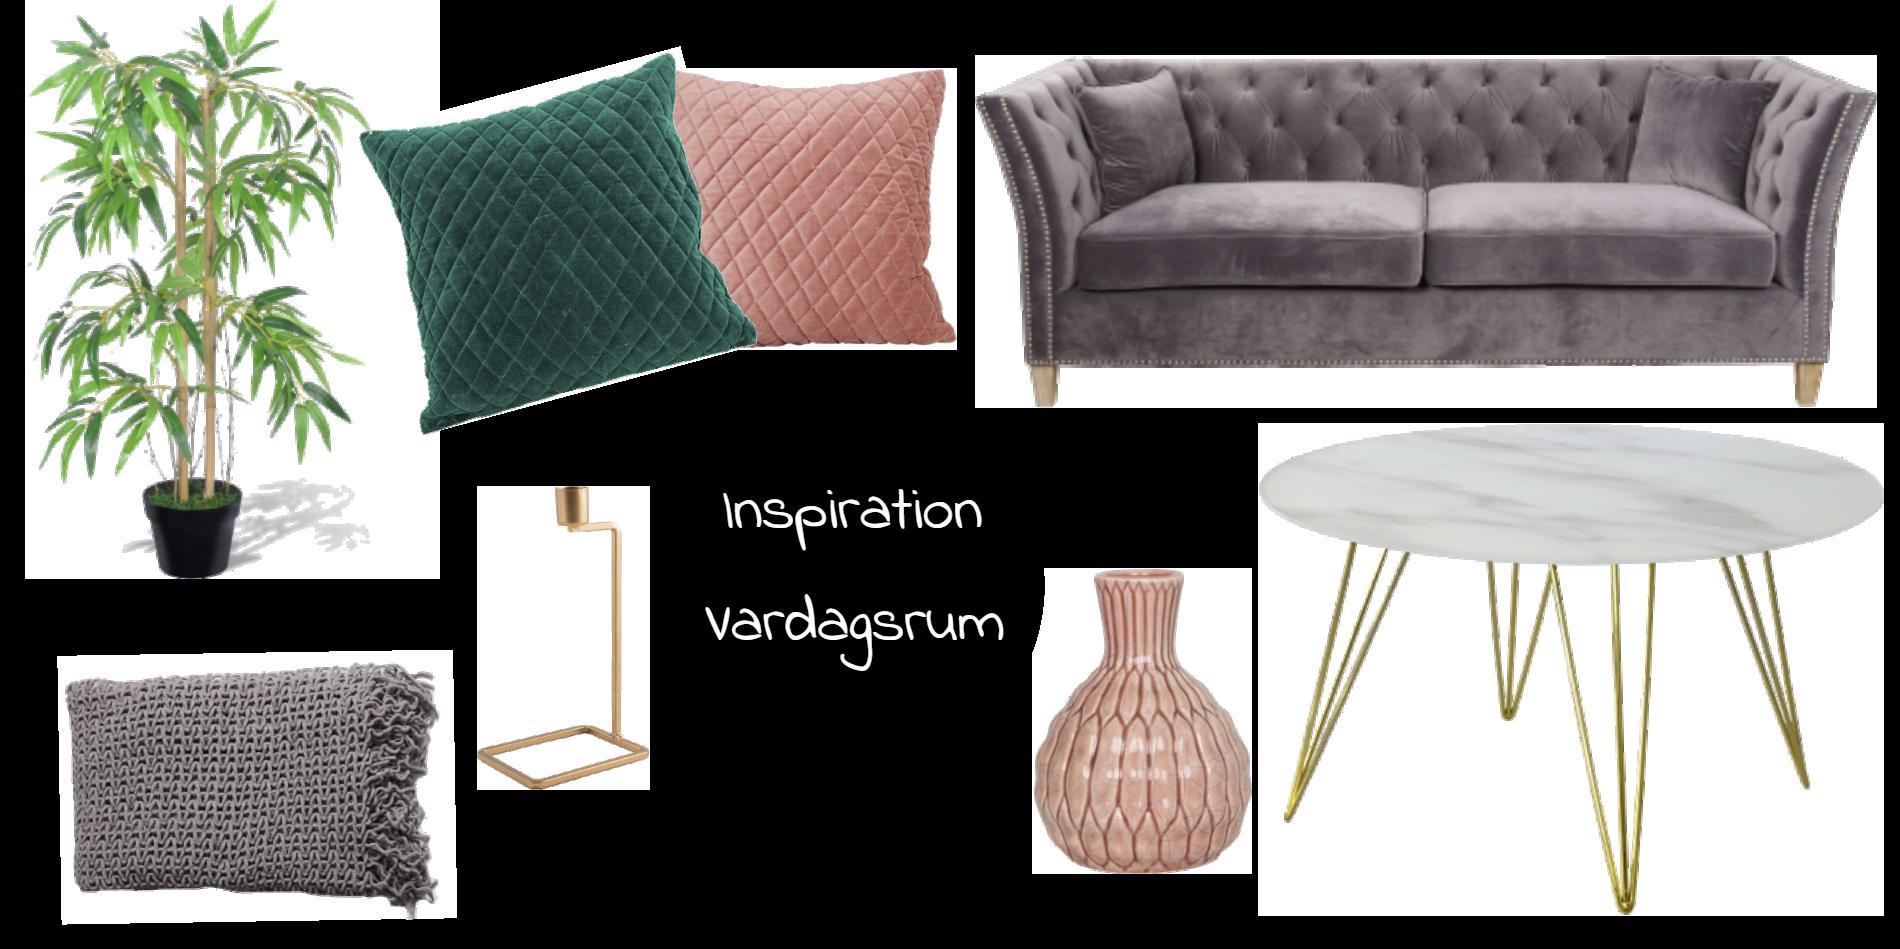 Inspiration - Vardagsrum